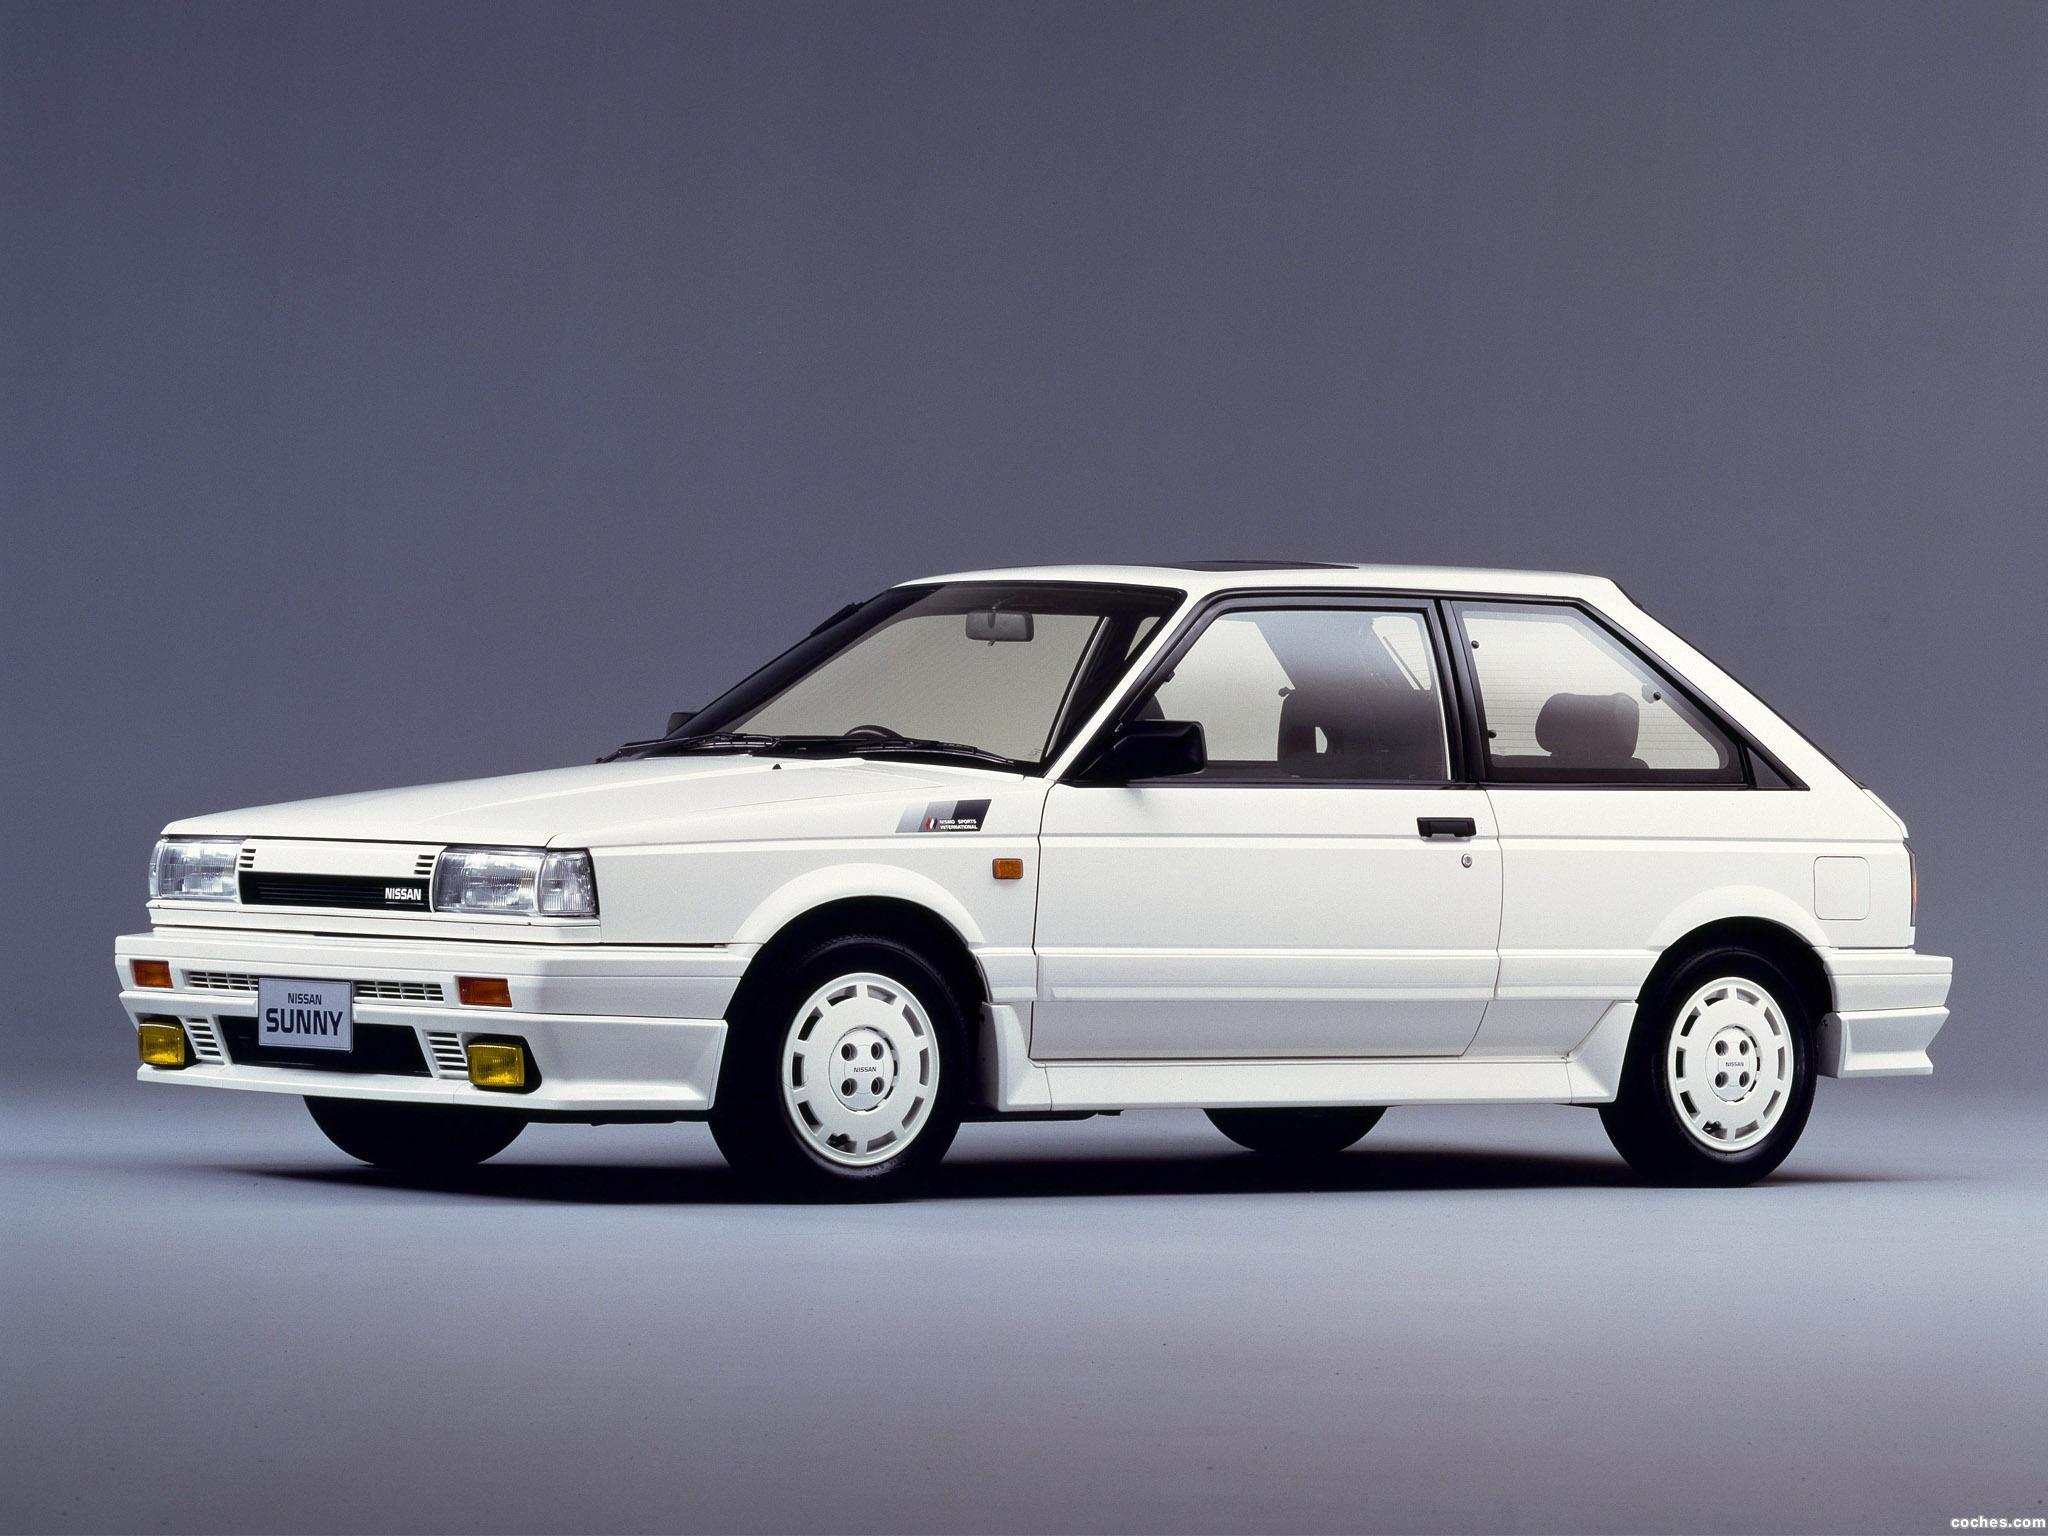 Foto 0 de Nissan nismo Sunny 305Re B12 1985